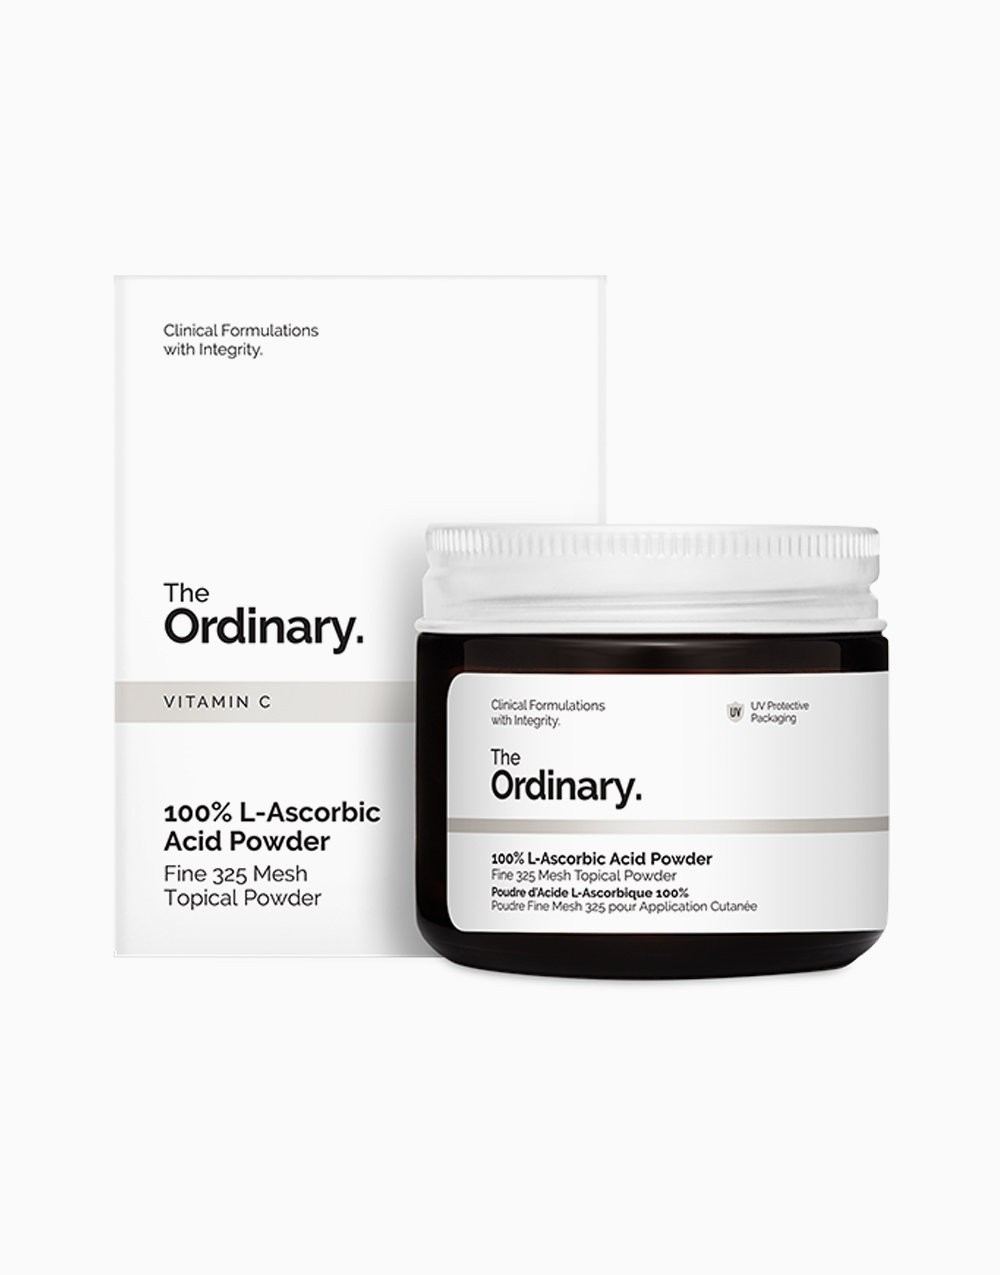 100% L-Ascorbic Acid Powder by The Ordinary